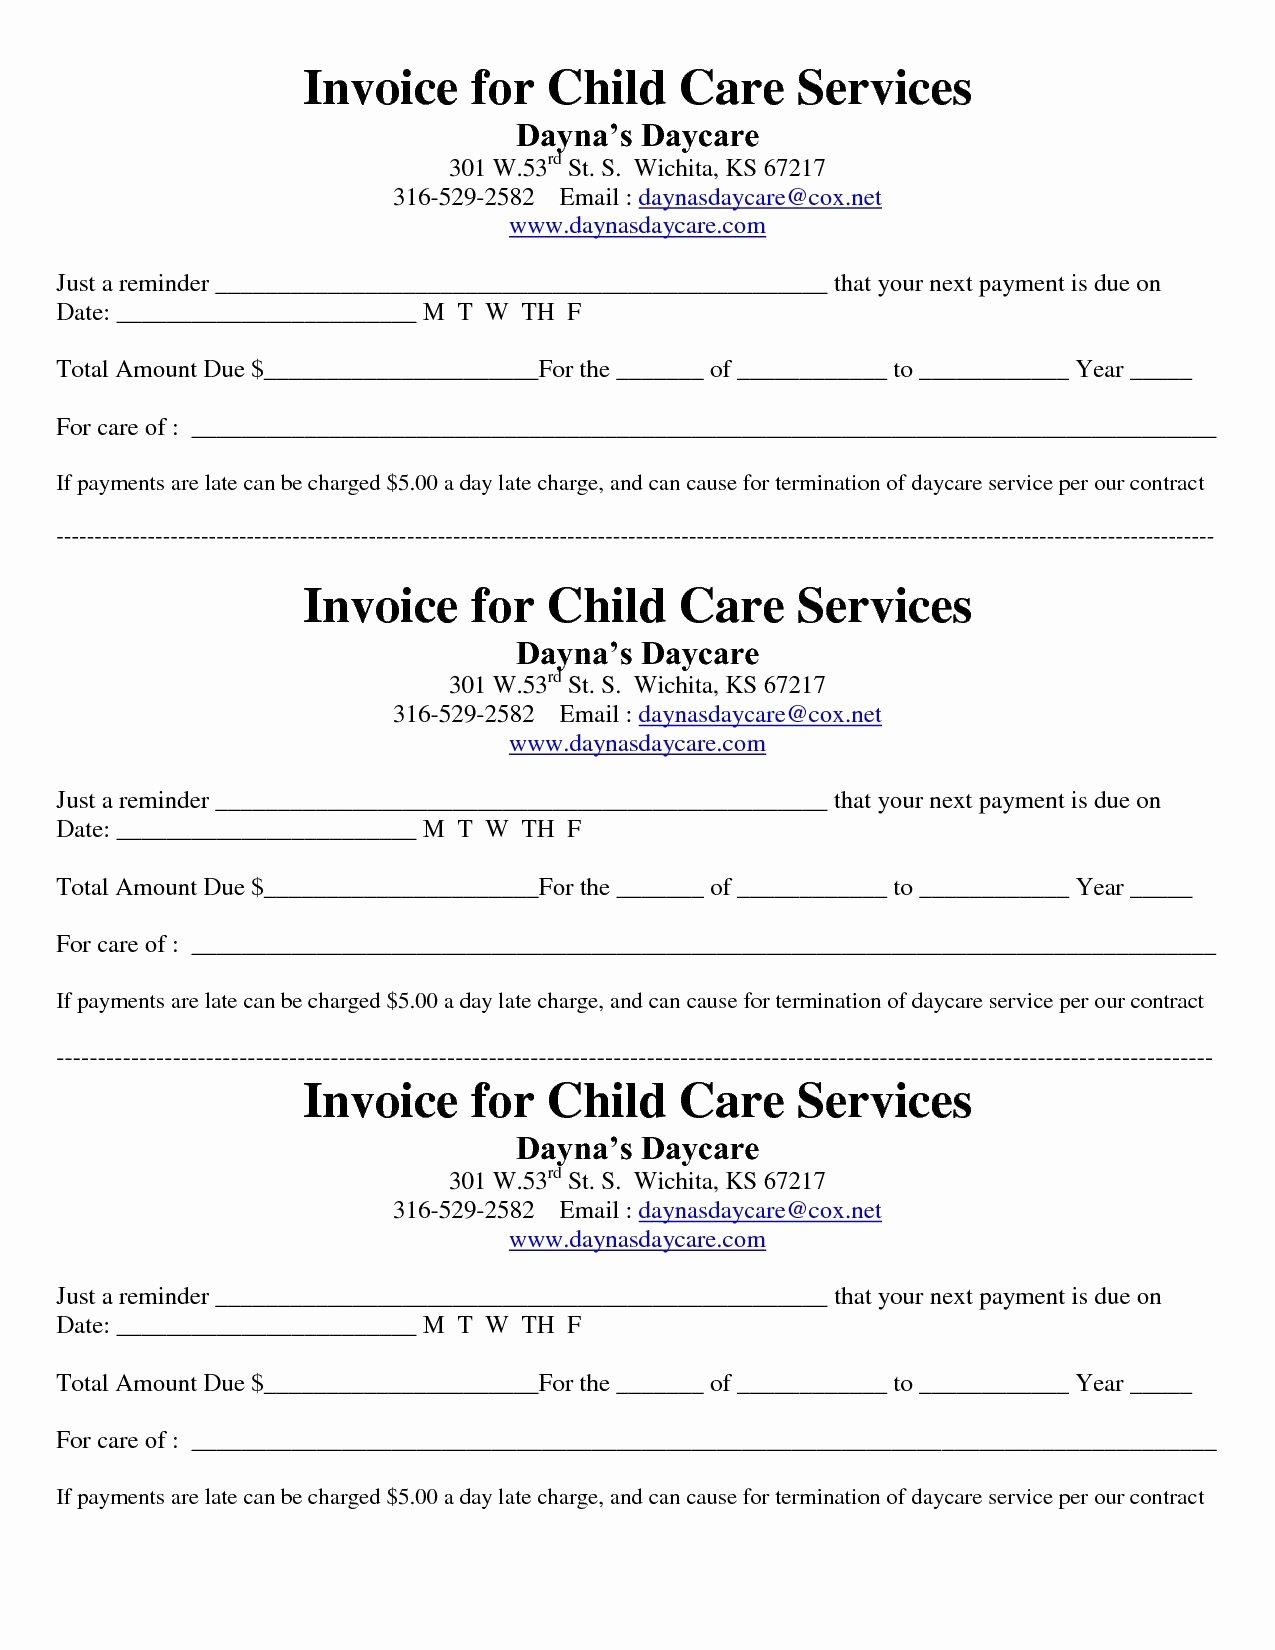 Child Care Invoice Template Best Of Child Care Receipt Invoice Jordi Preschool